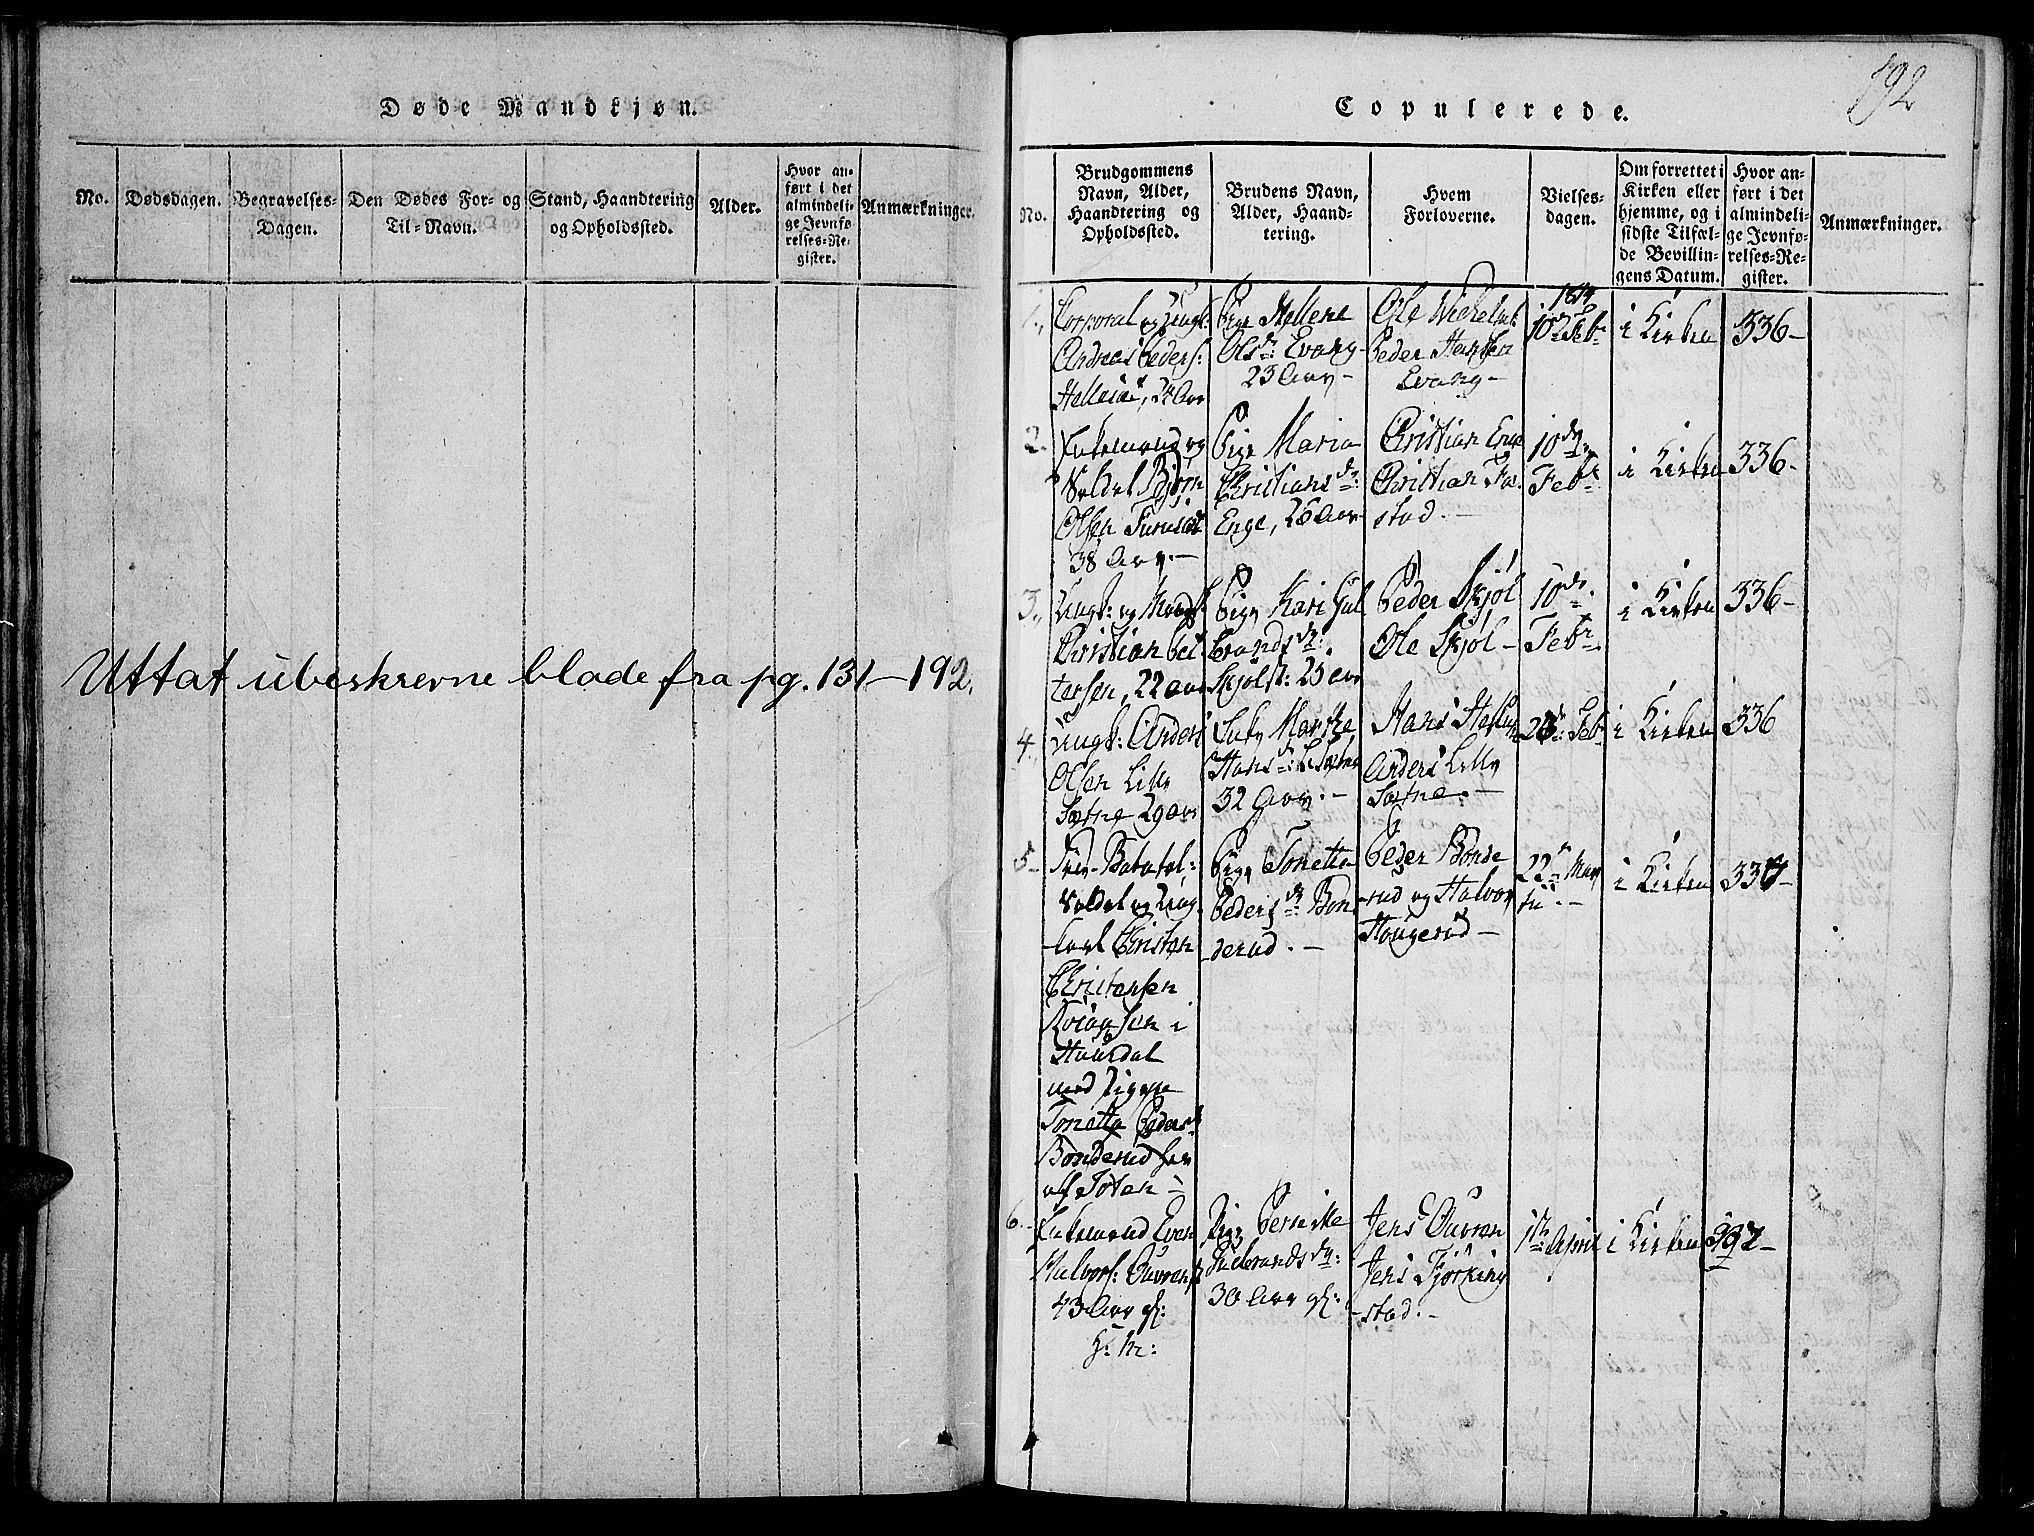 SAH, Toten prestekontor, Ministerialbok nr. 9, 1814-1820, s. 192